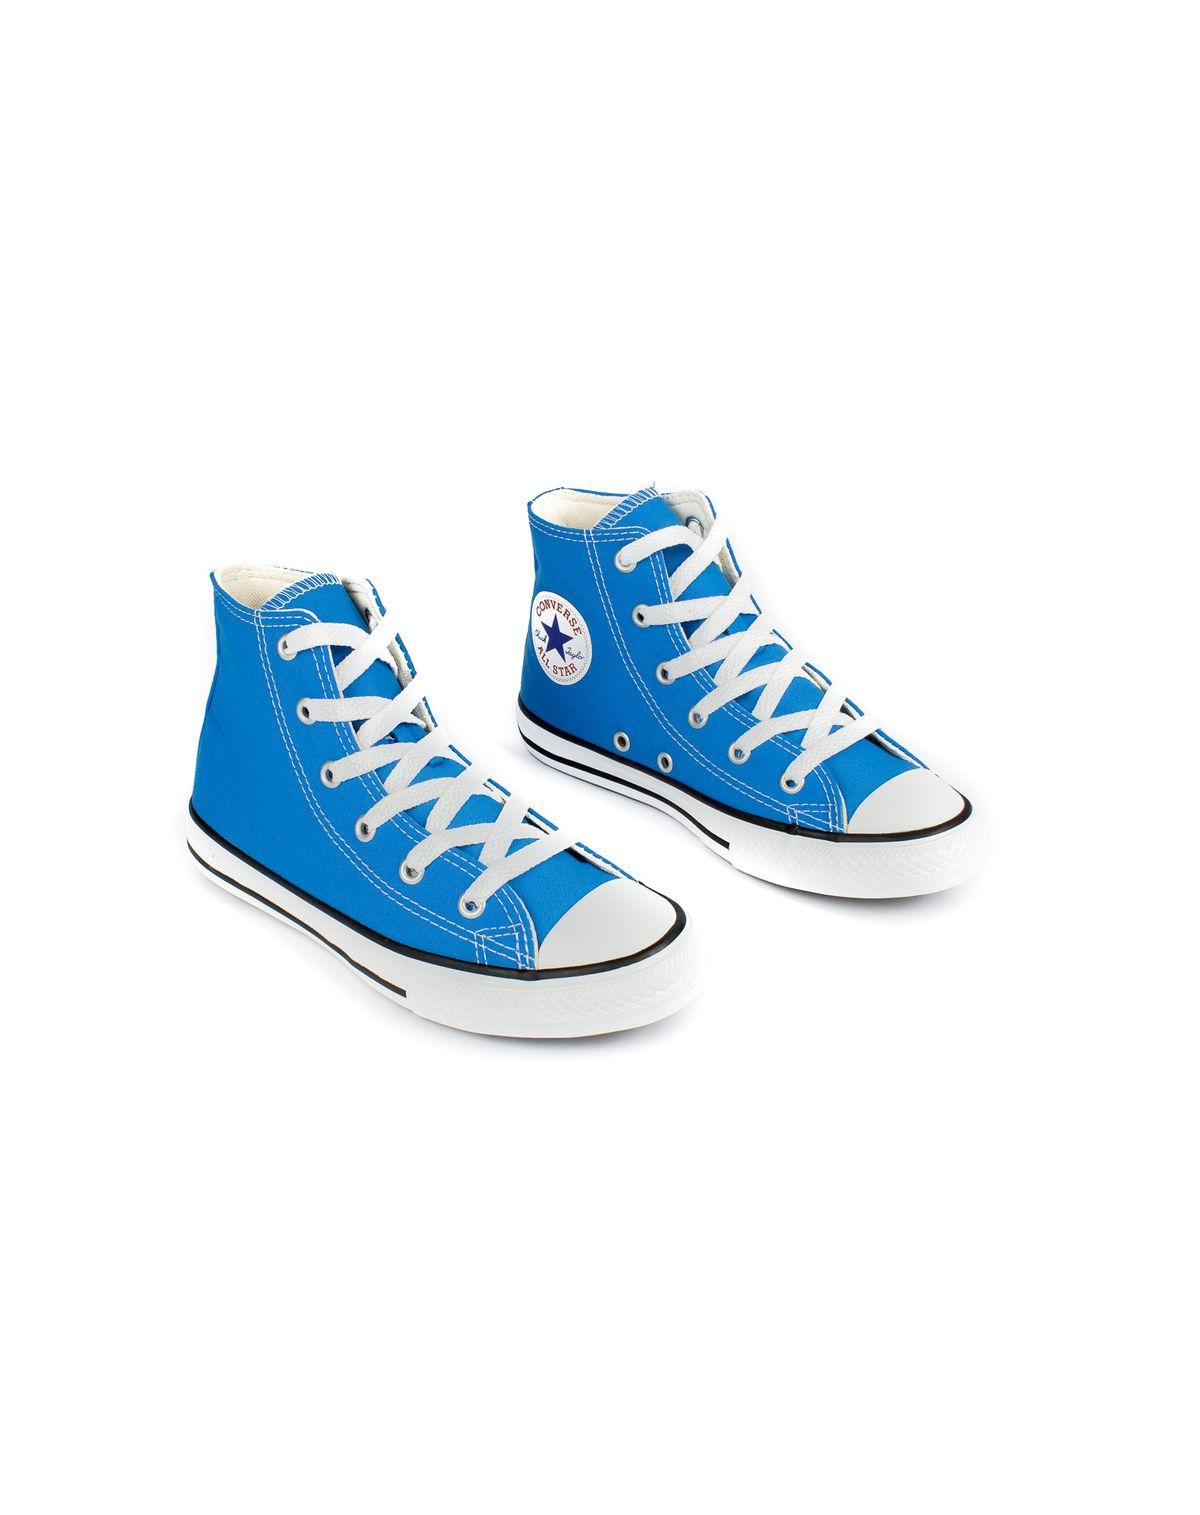 559799015-tenis-infantil-unissex-cano-alto-chuck-taylor-all-star-converse-azul-30-6fd